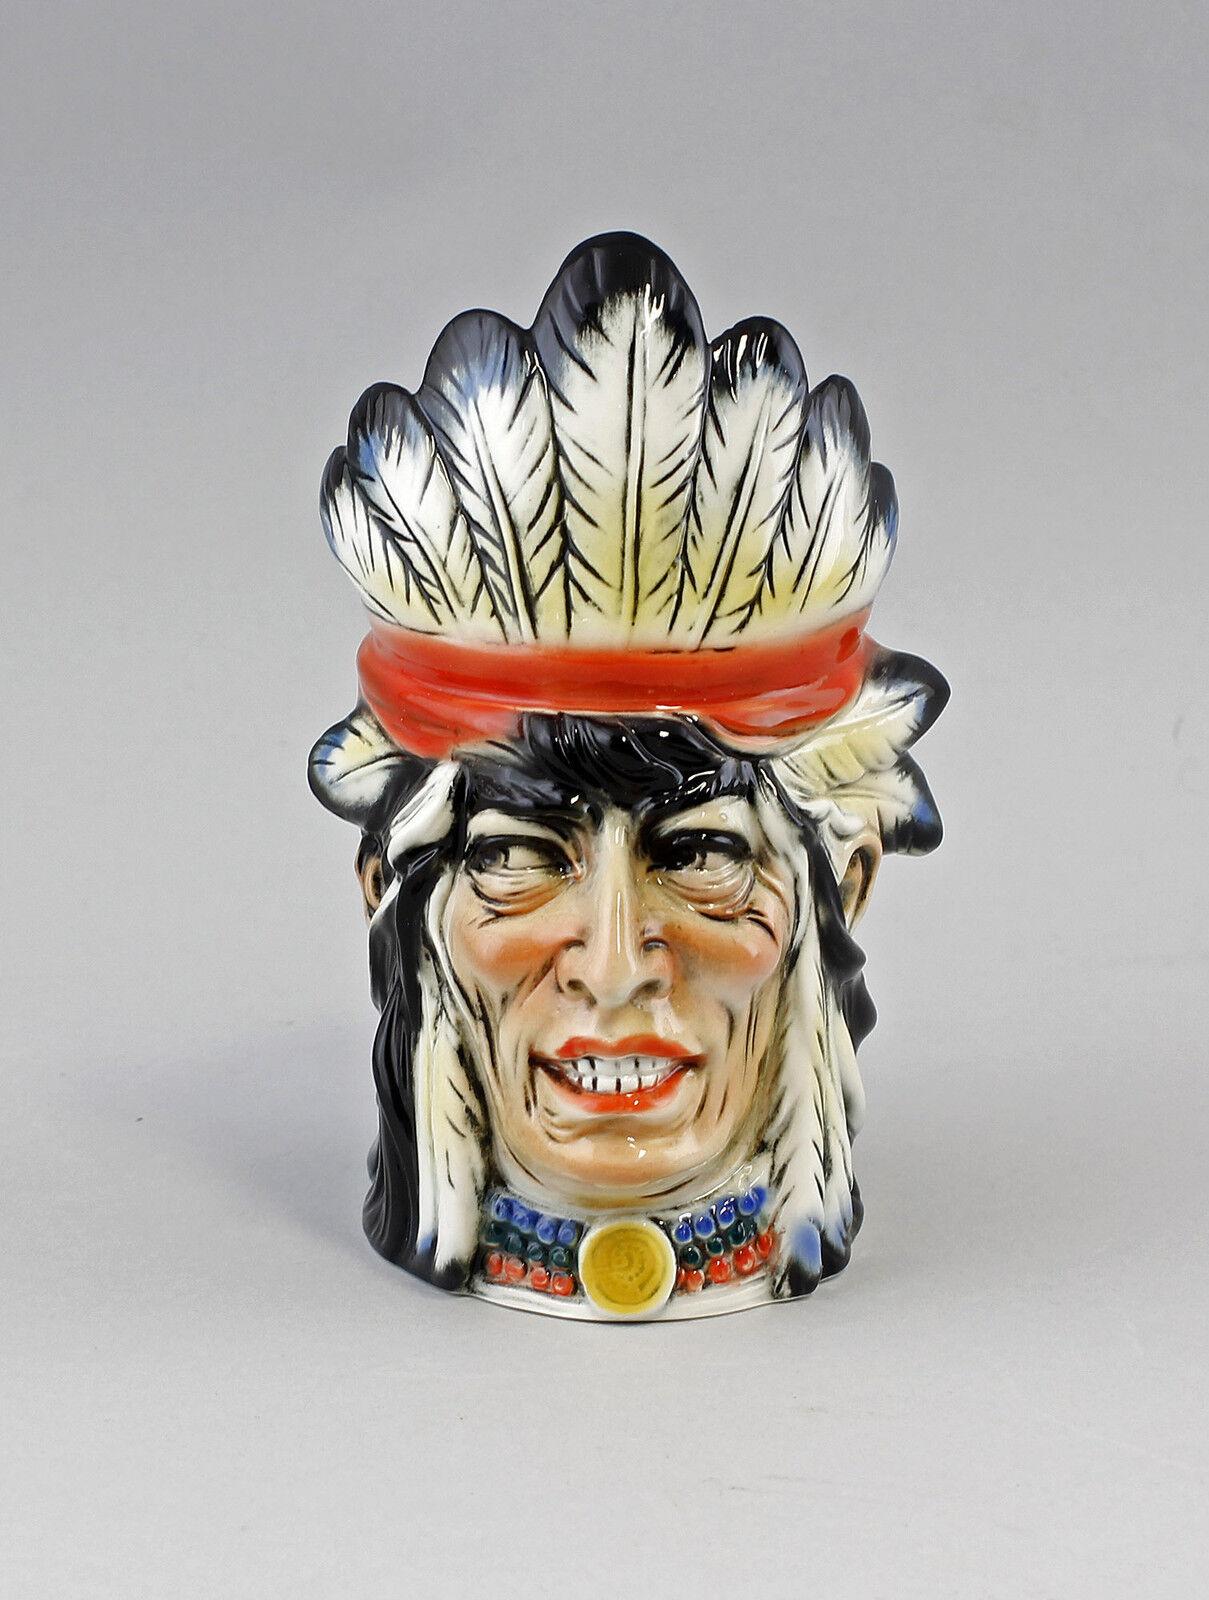 Porcelaine indiens-Gobelet Tasse ENS 16,5x10, 5 cm 9941709